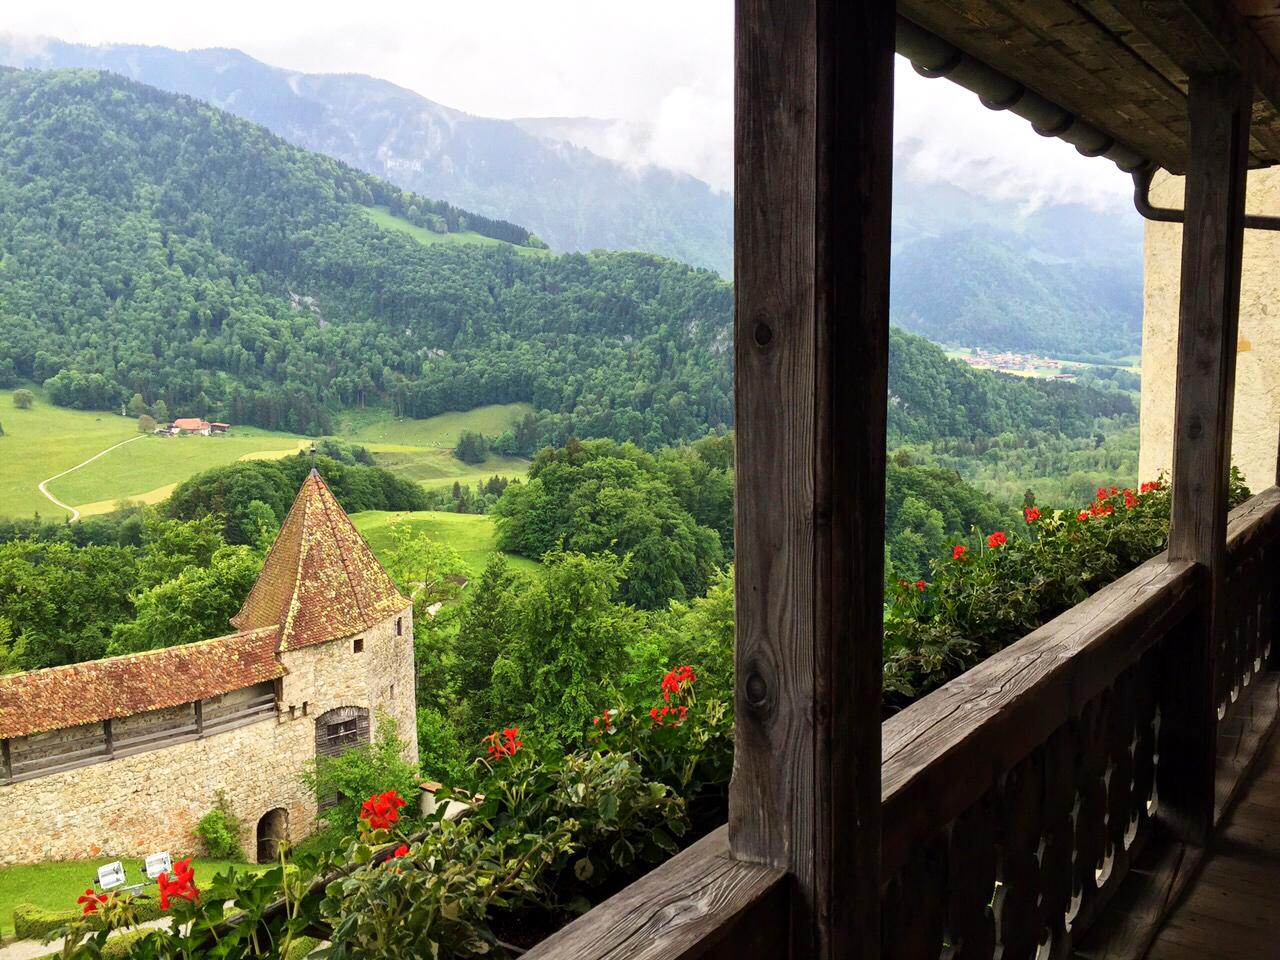 valley greenery gruyere, gruyere, Saane river, Switzerland